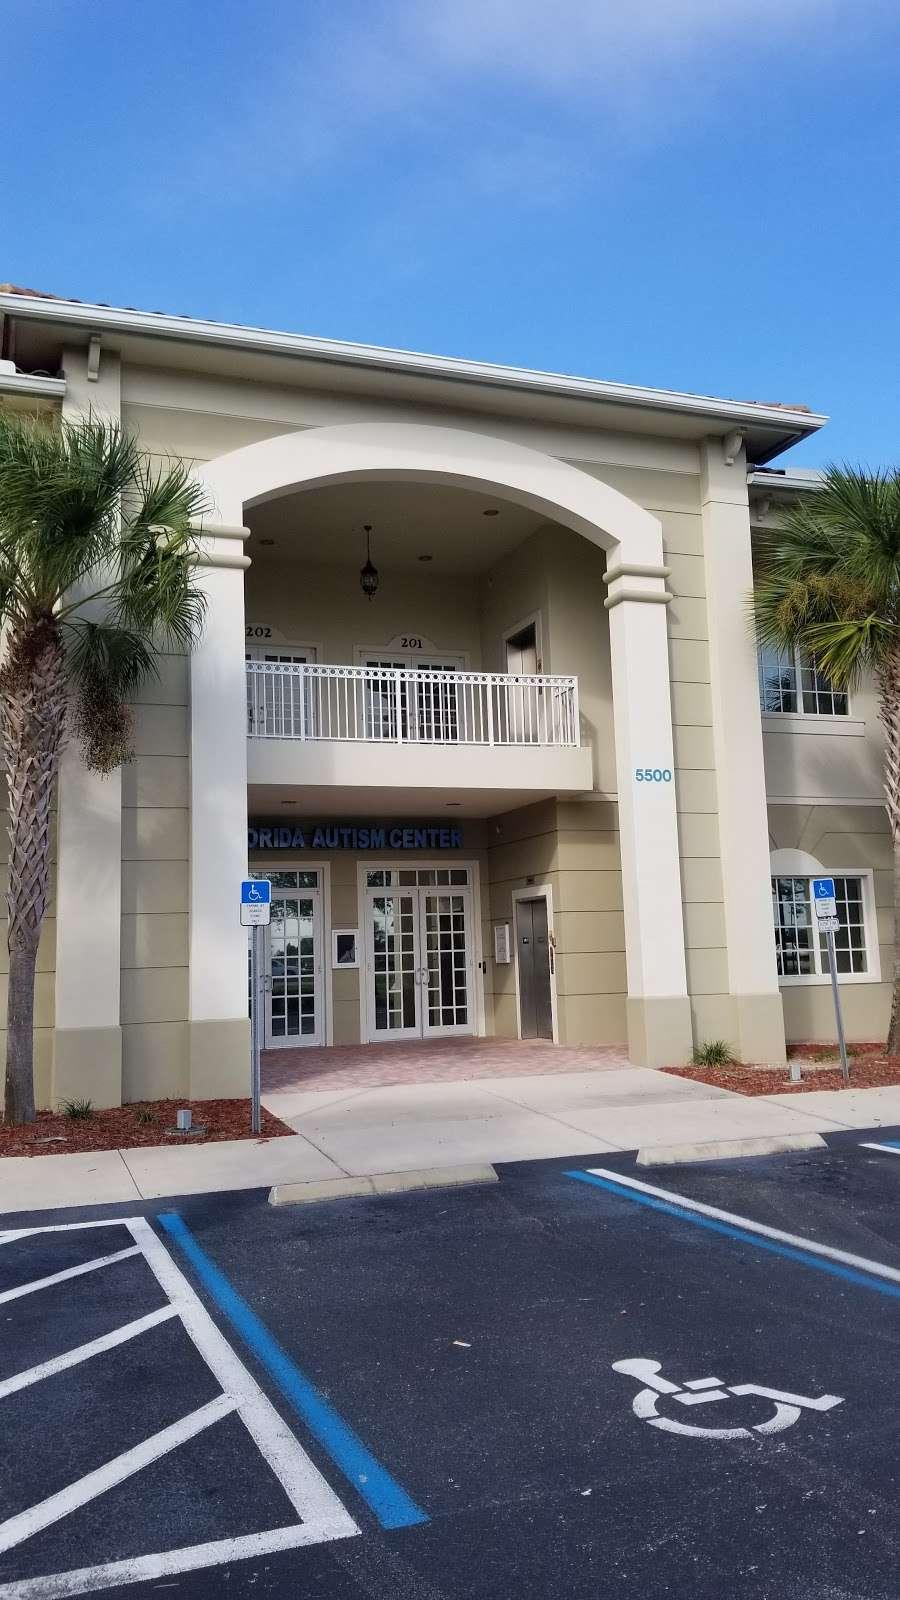 Florida Autism Center - school  | Photo 3 of 3 | Address: 5500 Murrell Rd #100, Melbourne, FL 32940, USA | Phone: (321) 426-7759